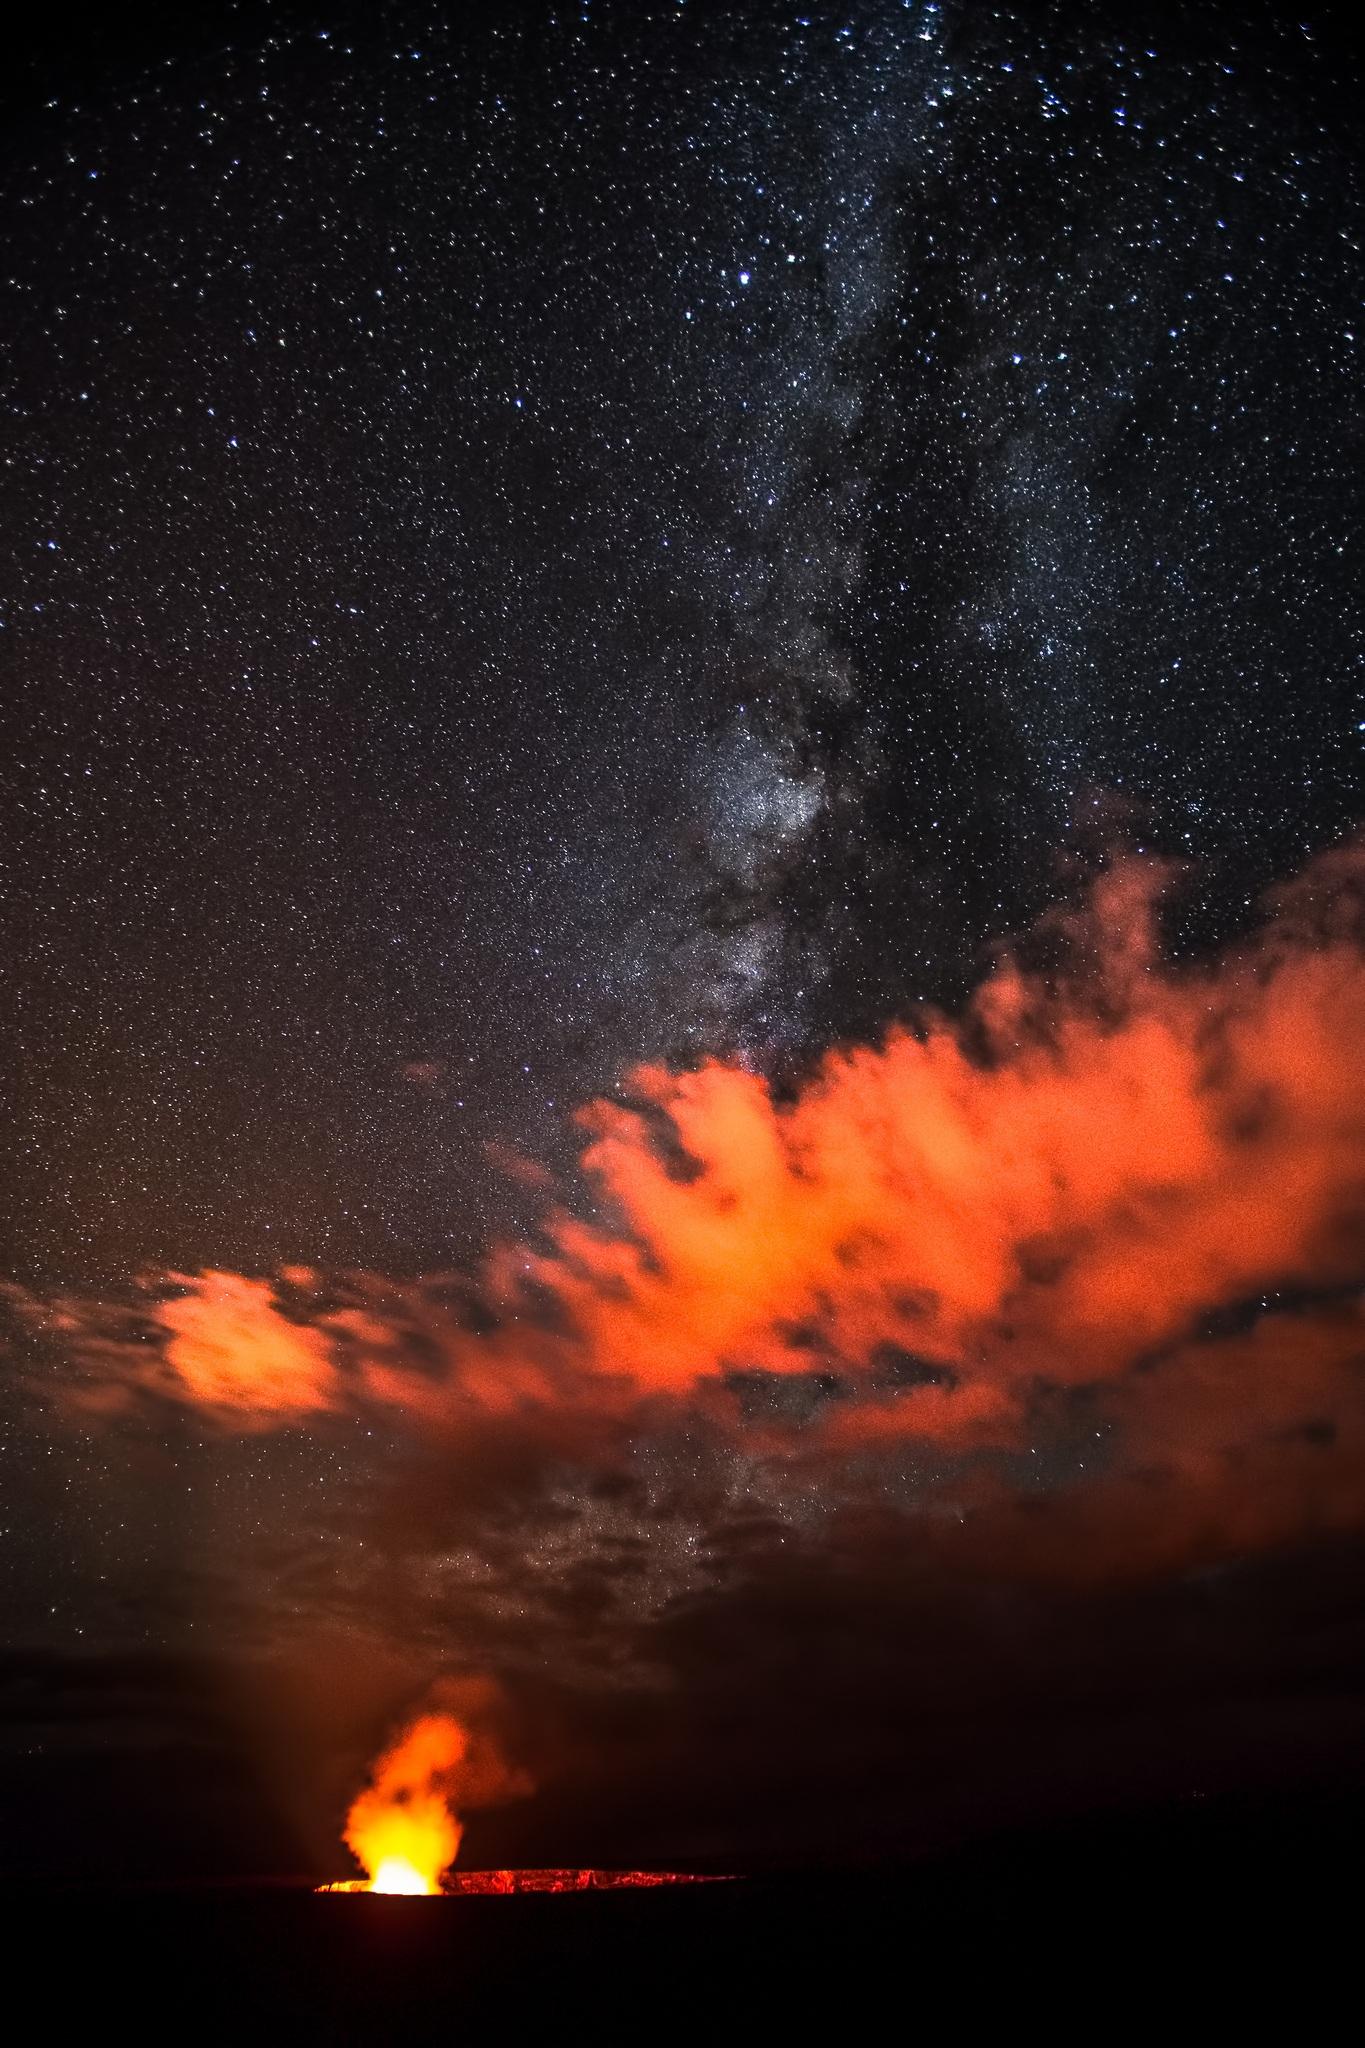 Milky Way Galaxy Glows Over Fiery Hawaiian Volcano in Stargazer's Photo